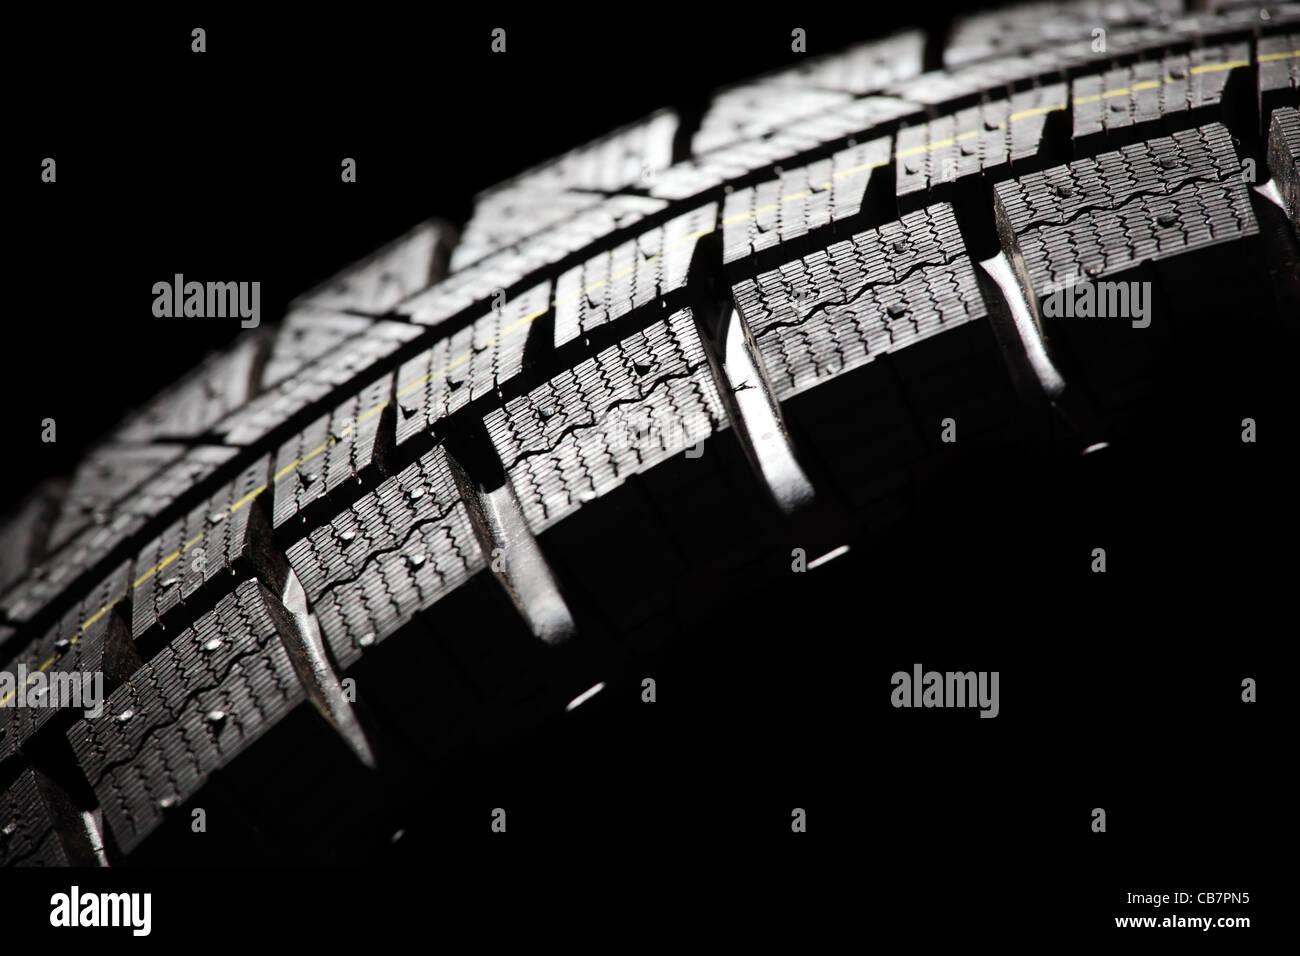 Teil des brandneuen Auto Reifen hautnah. Horizontale Komposition. Stockbild